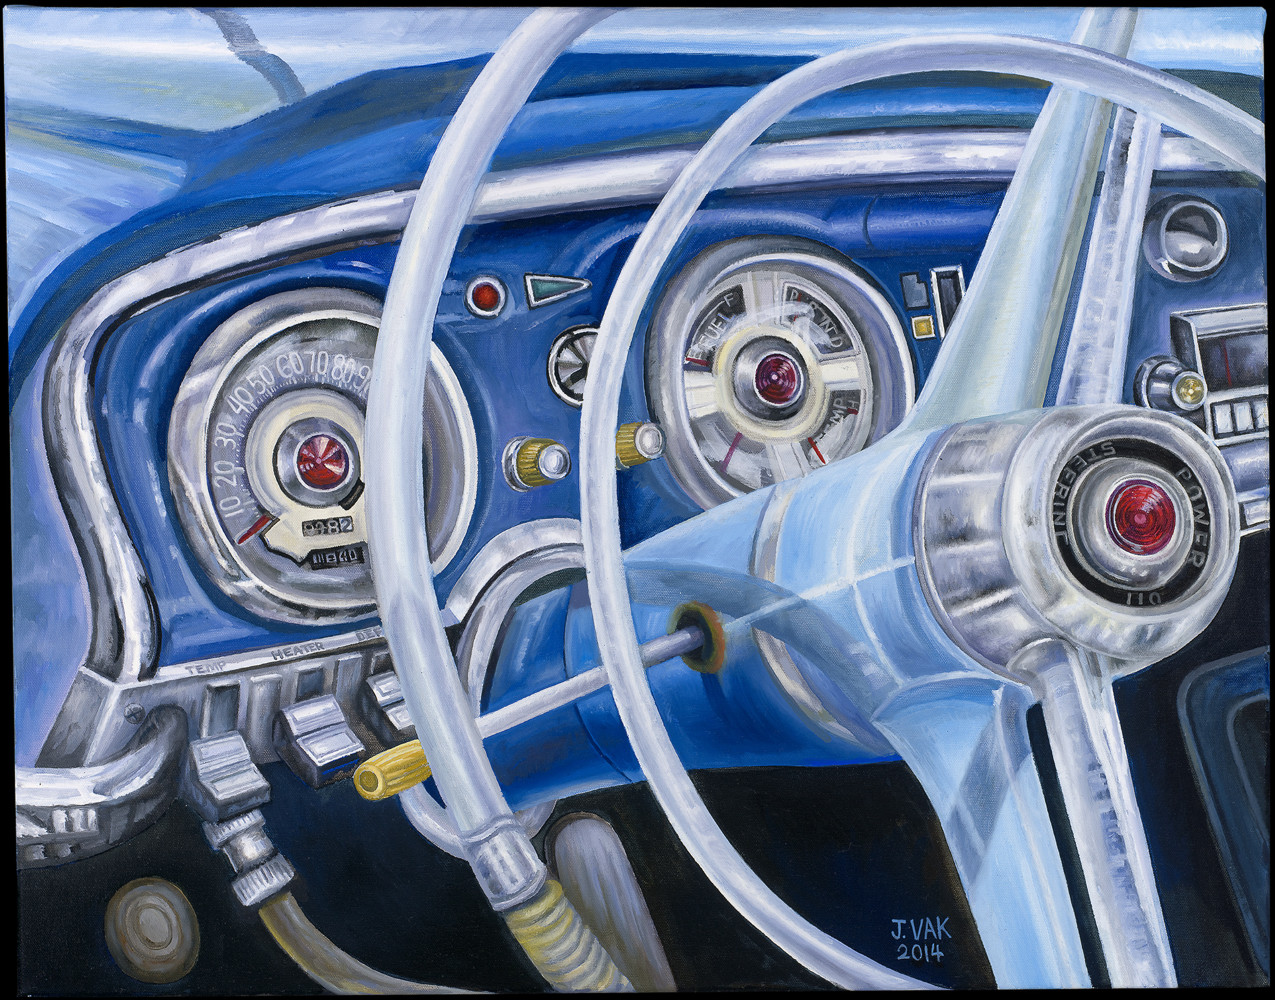 1960 Chrysler Windsor Interior           22x28 Original Oil                    $3500                     2014